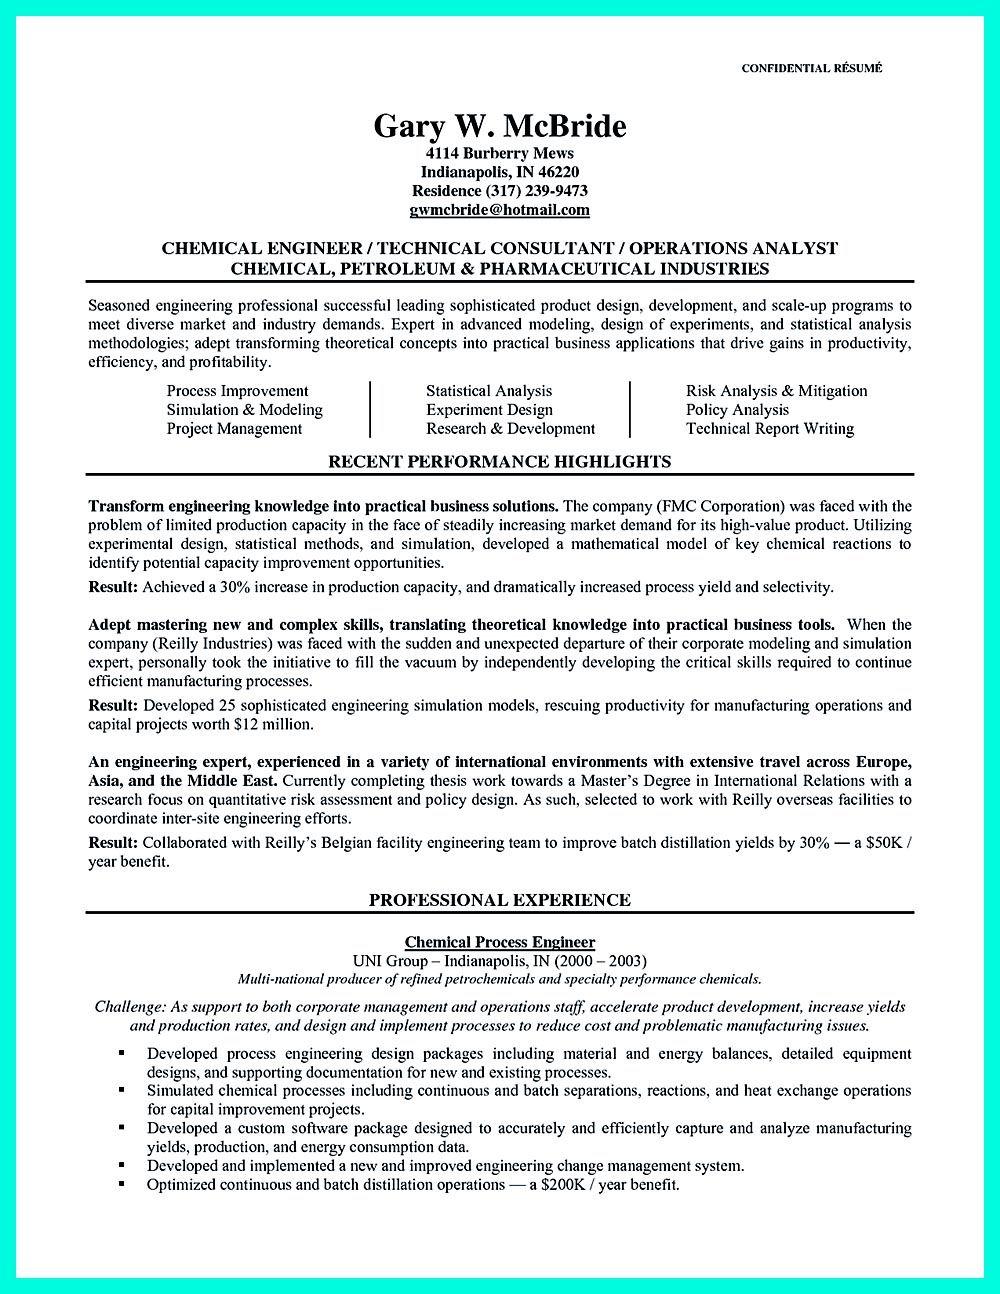 Ionic 3 Platform Resume Example